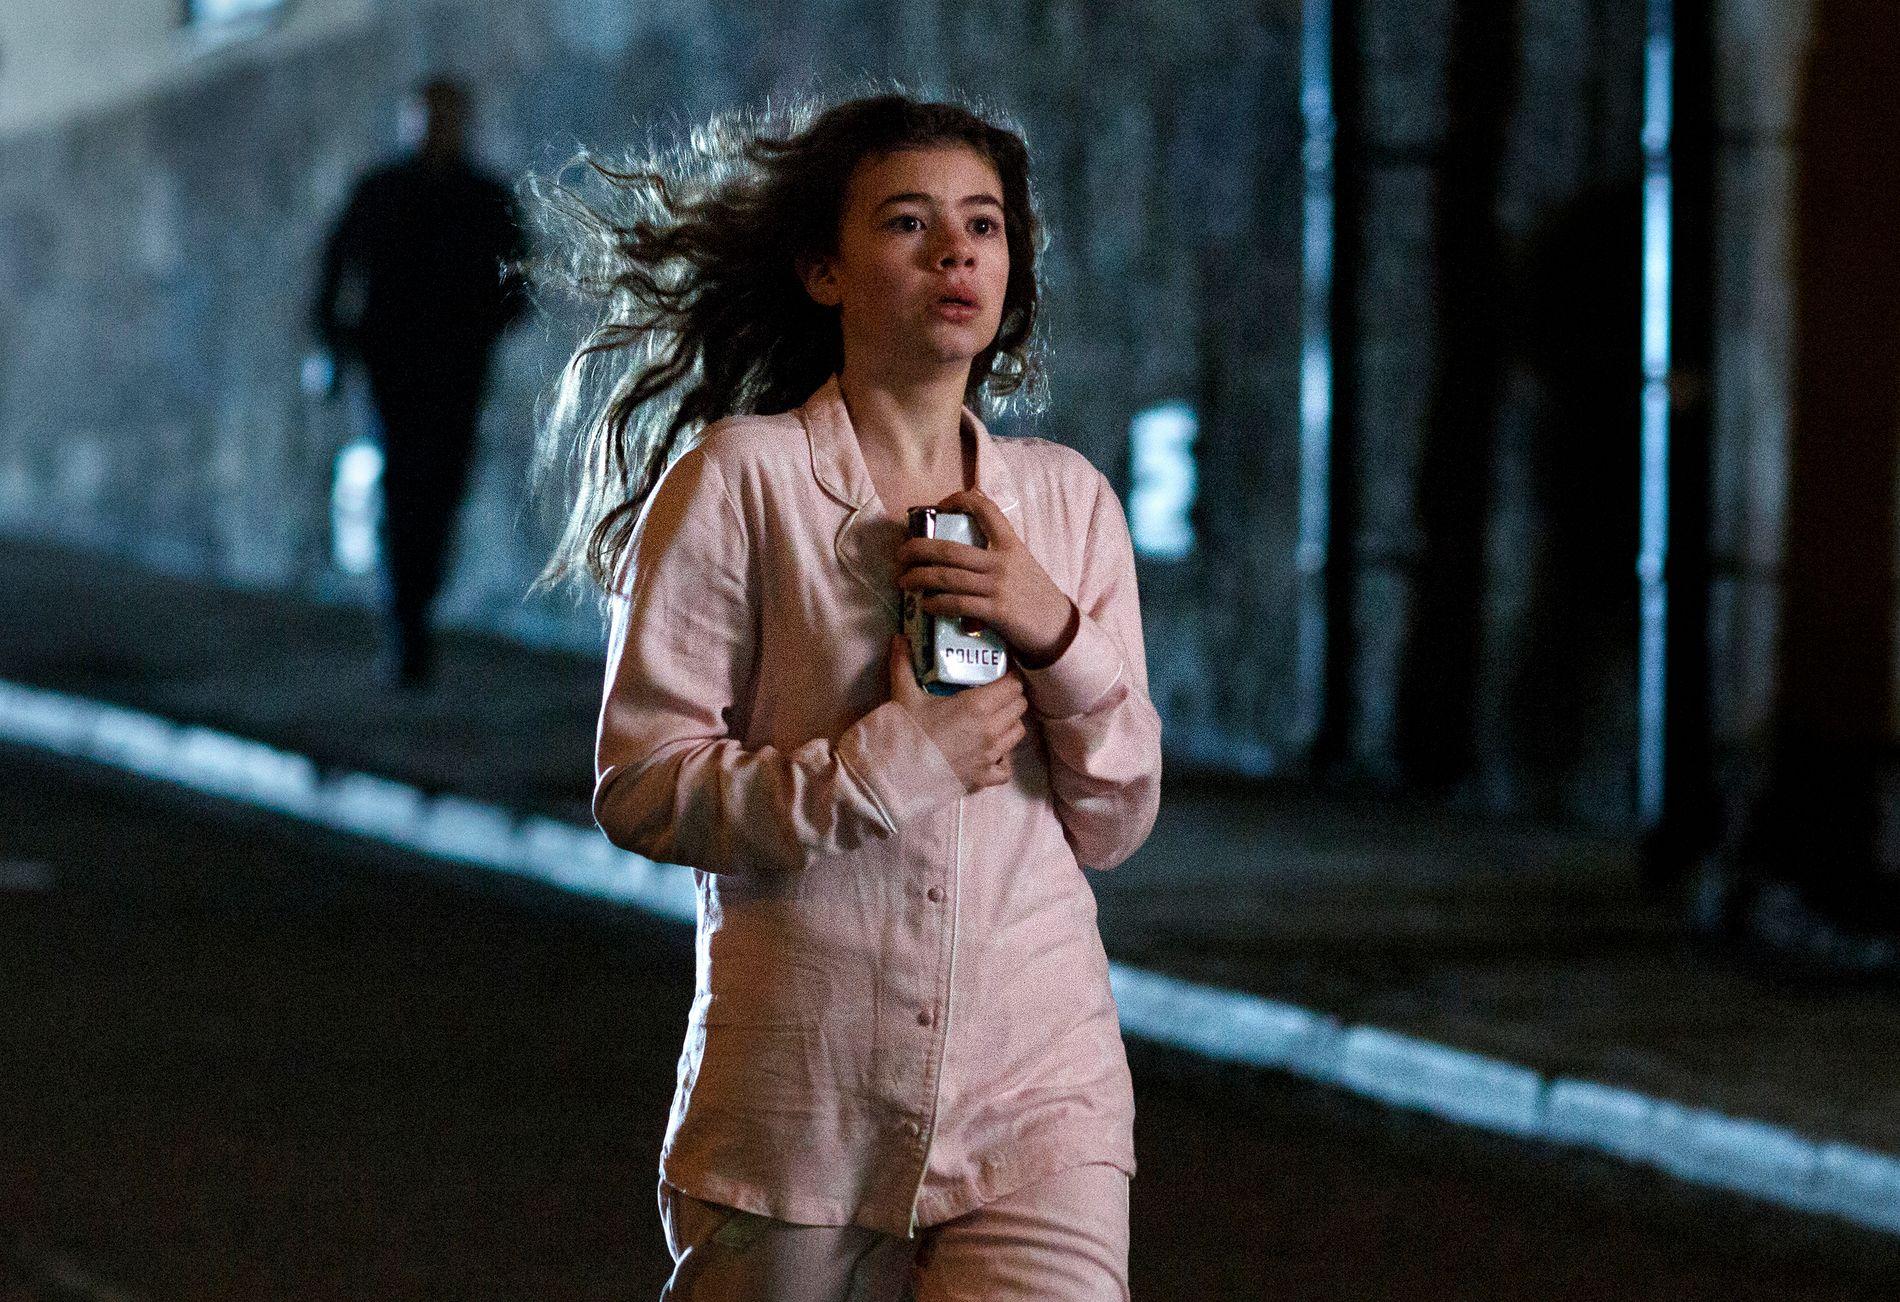 SPENNING: Esmeralda Struwe i rollen som Stina Vik, her forfulgt av en mystisk mann i «Modus».